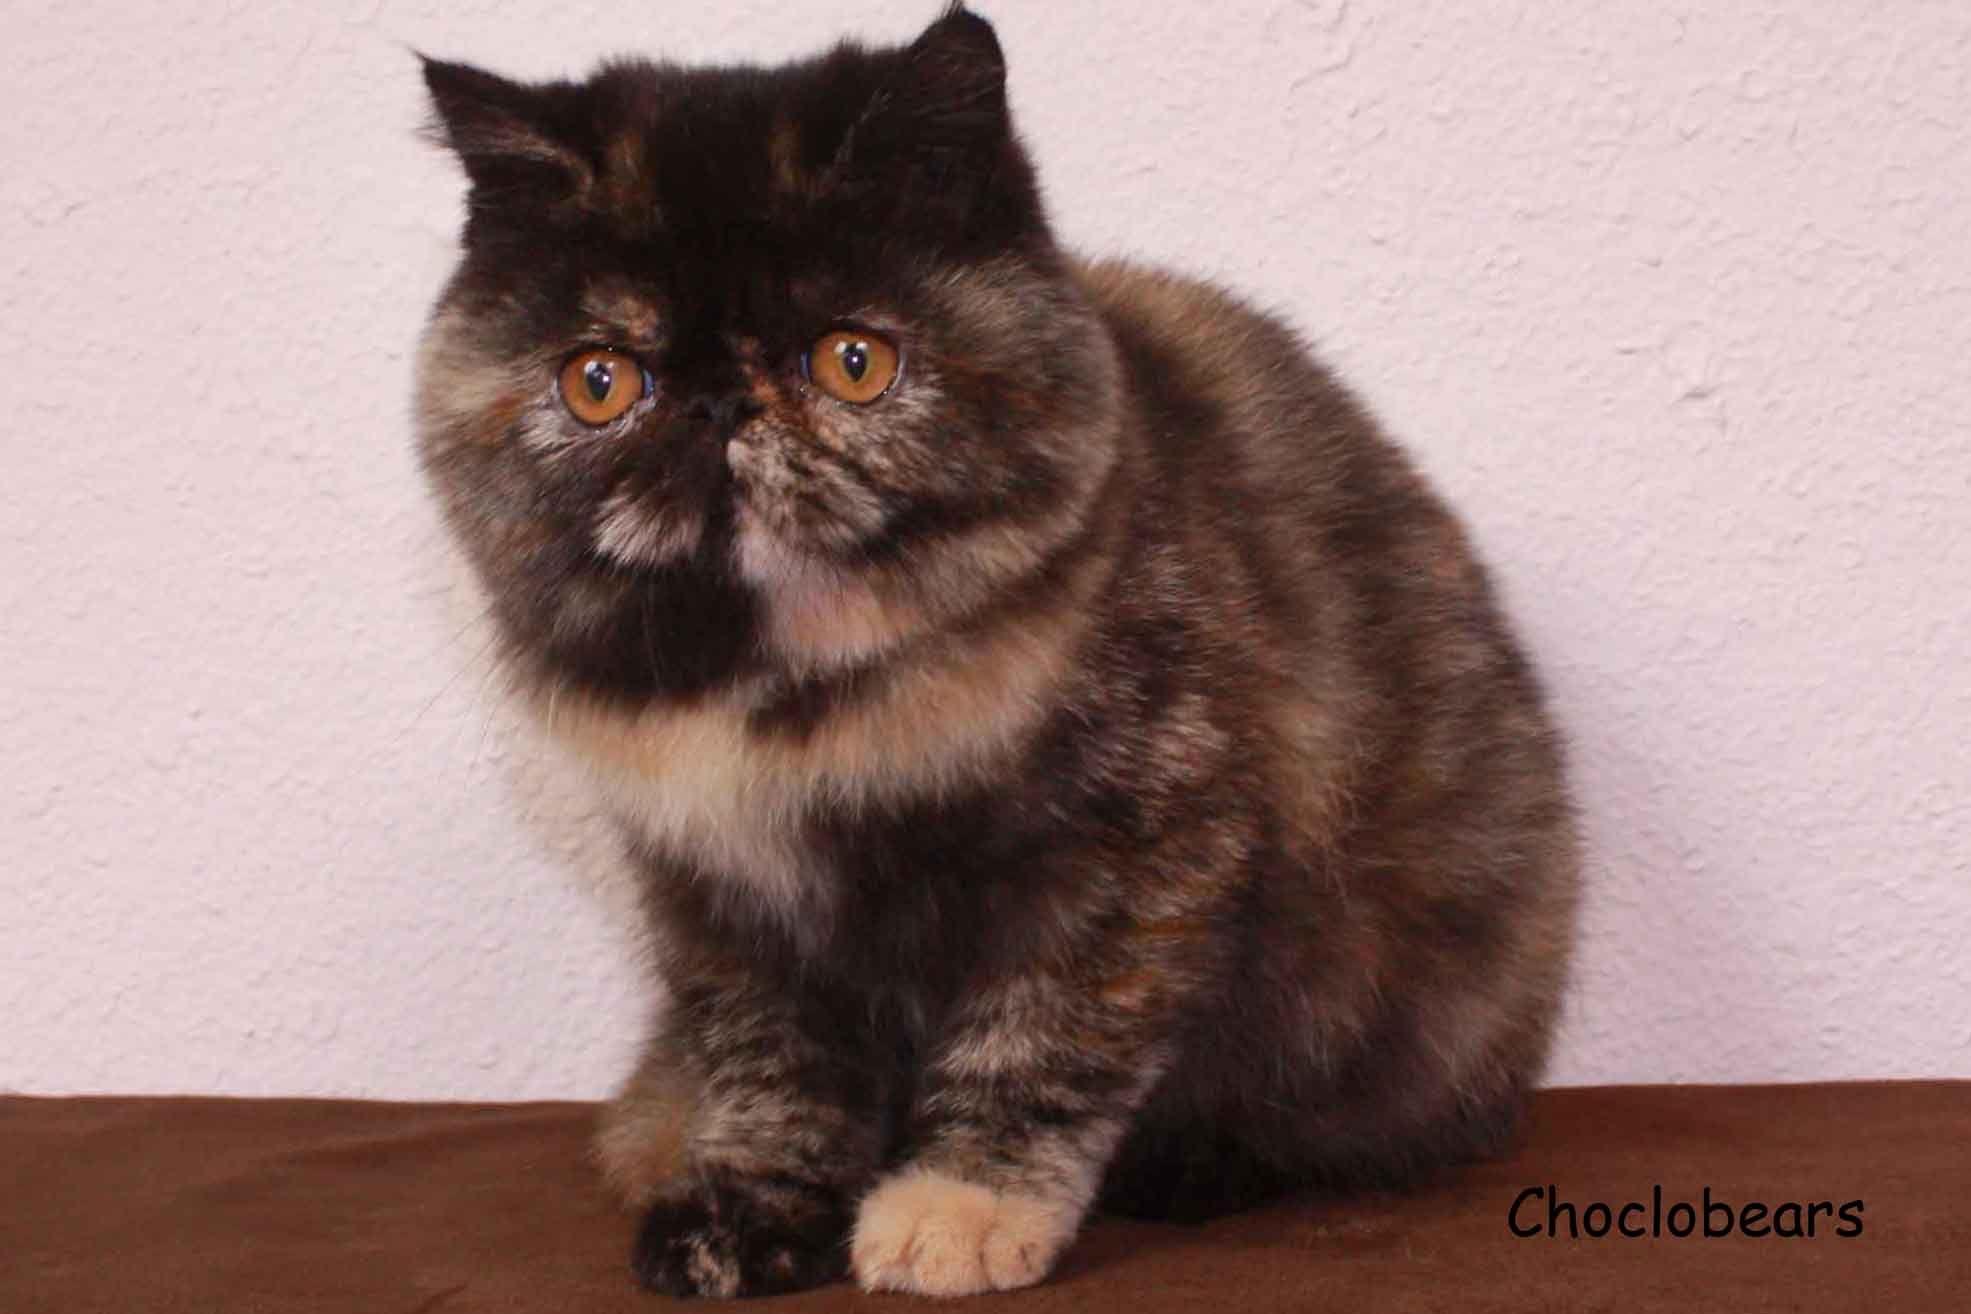 Pin On Choclobears Exotic Shorthair Persian And Himalayan Cats